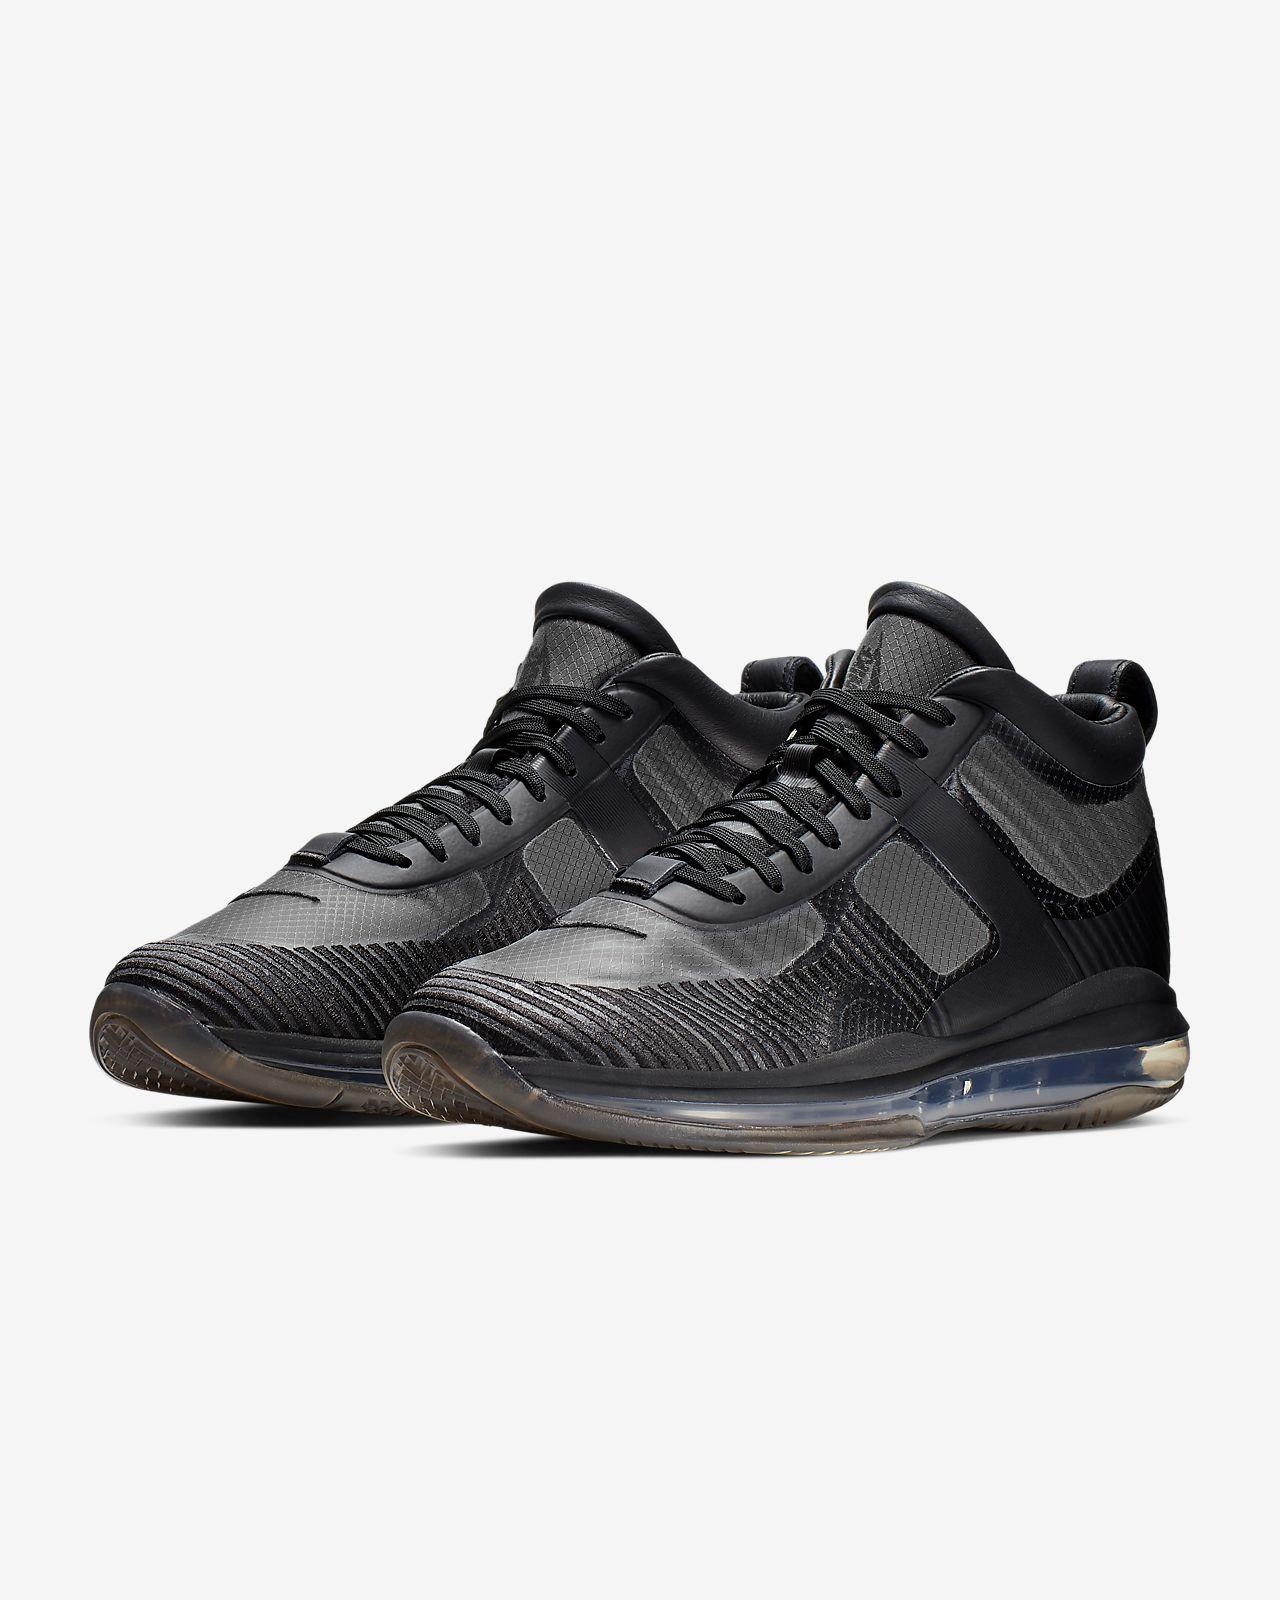 9361b44e6 LeBron x John Elliott Icon Shoe